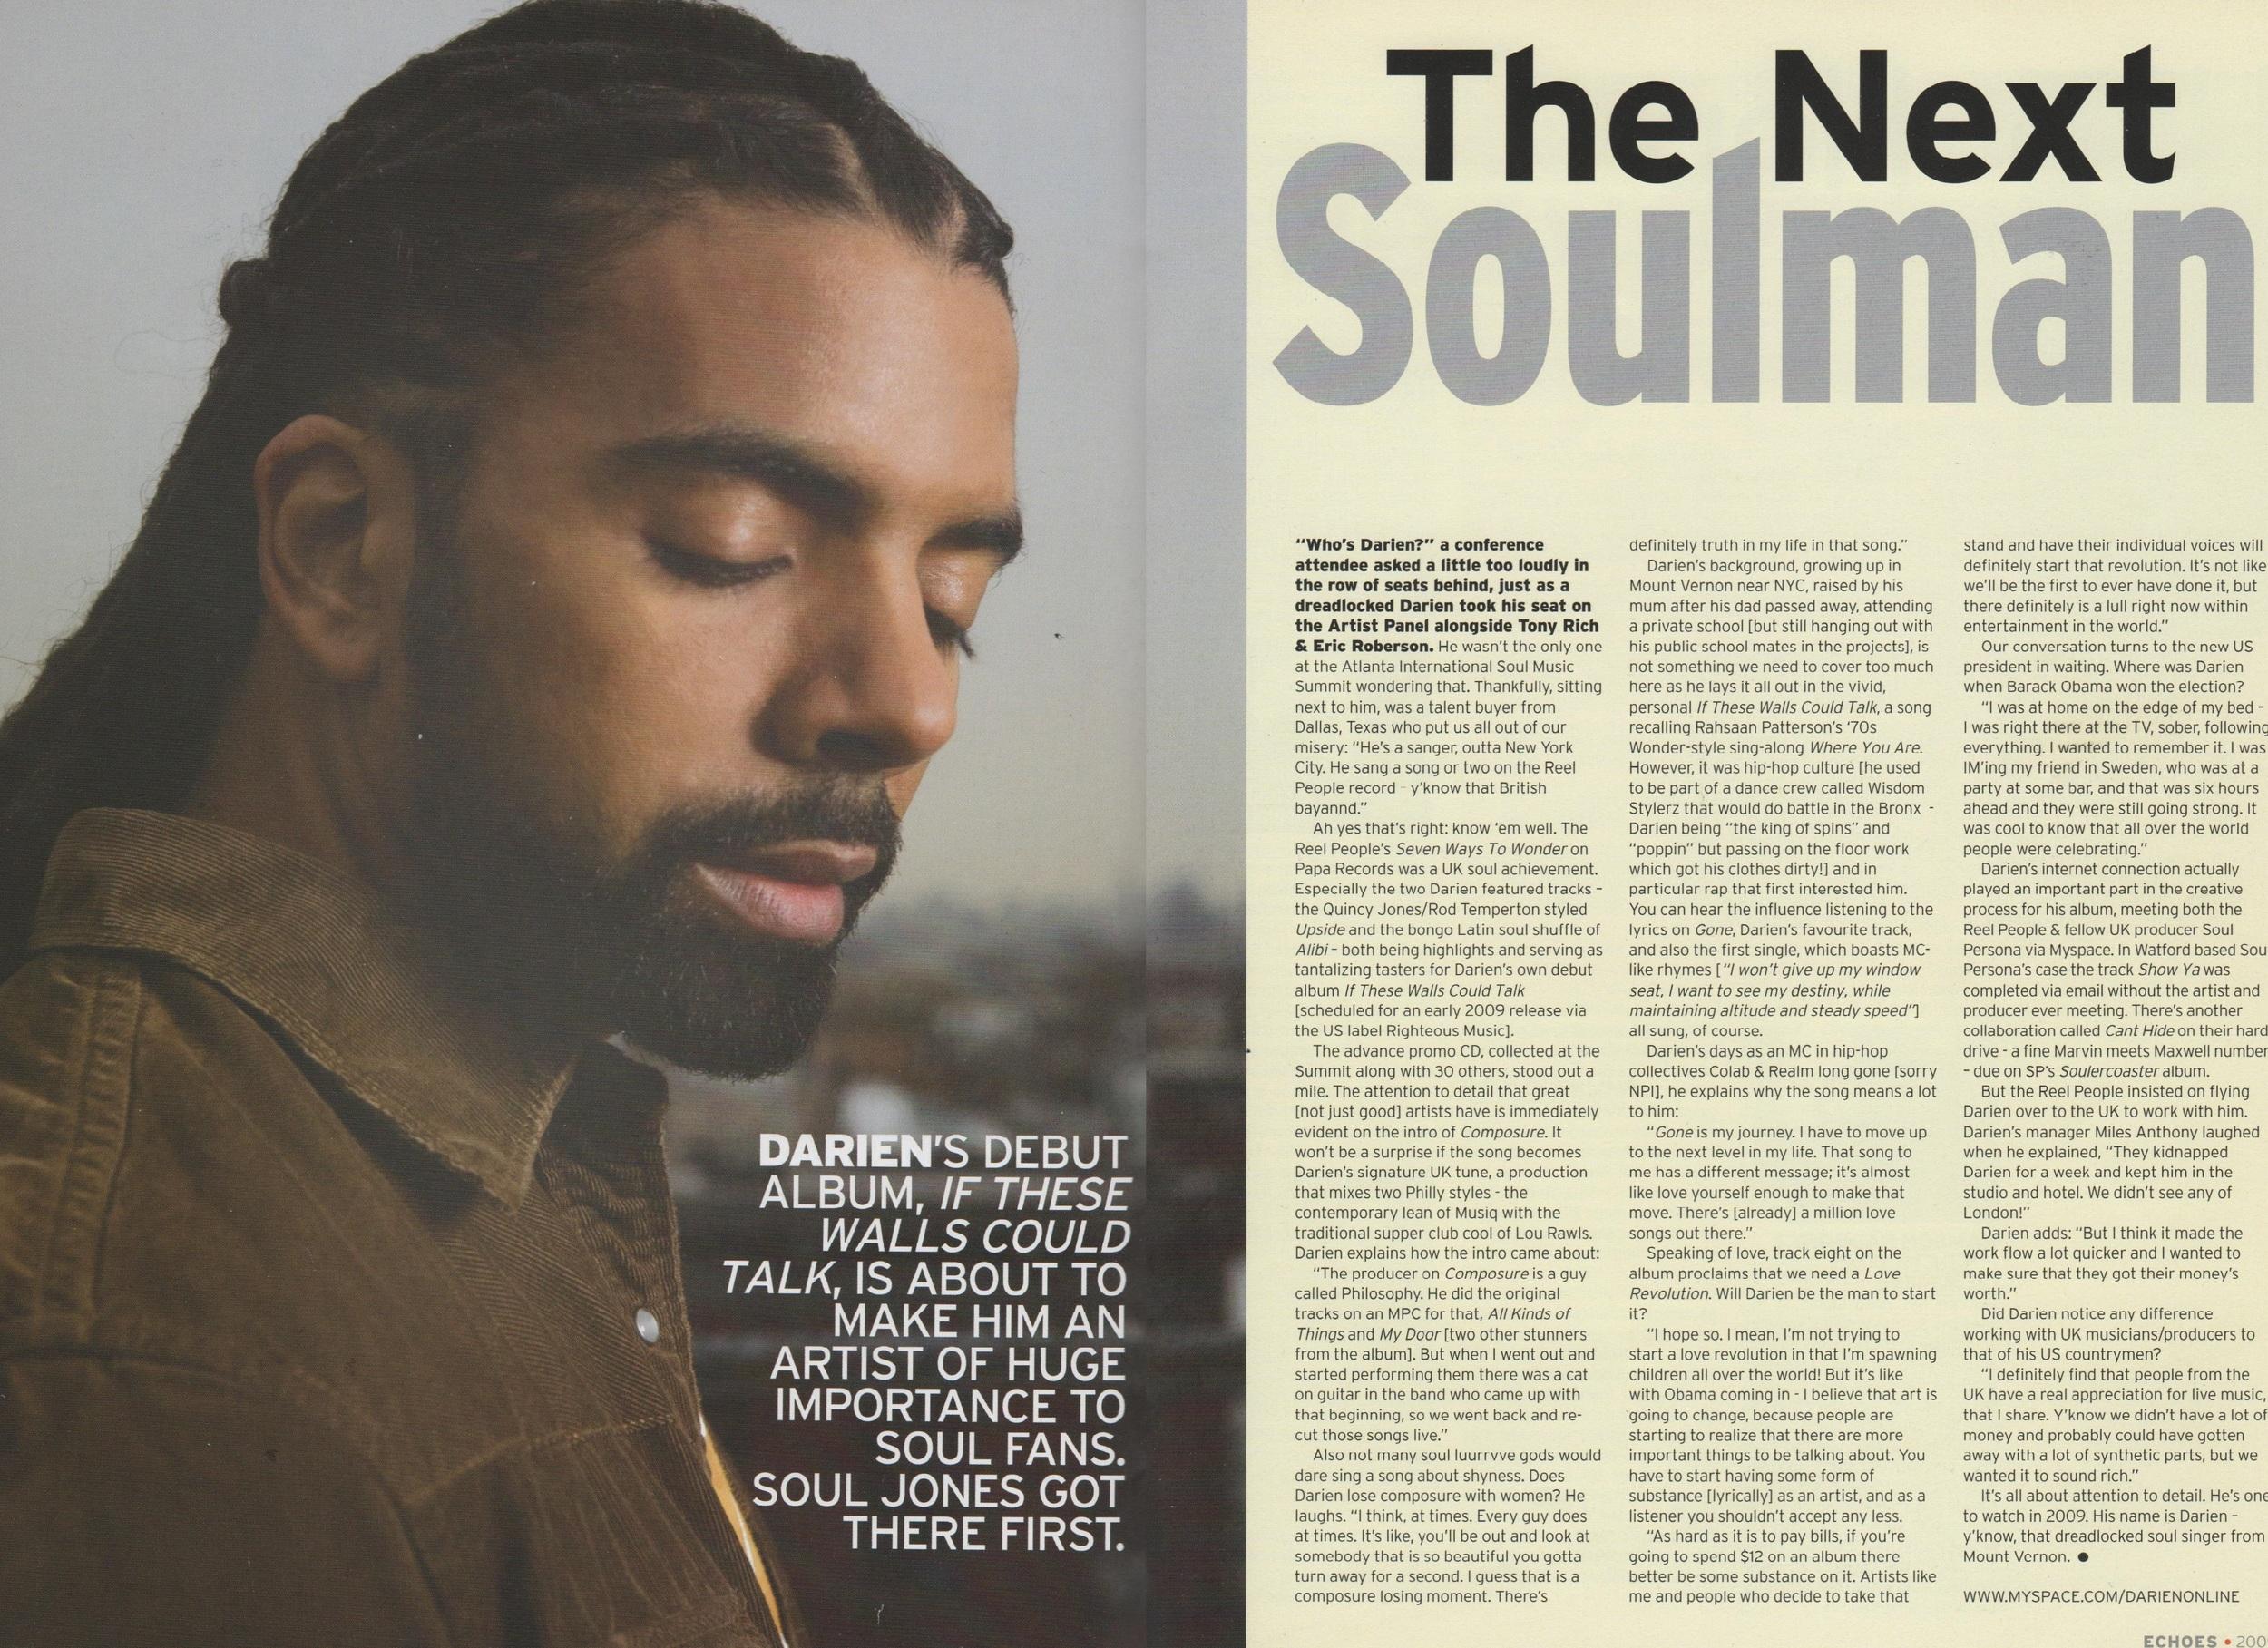 Echoes Magazine Feb 2009